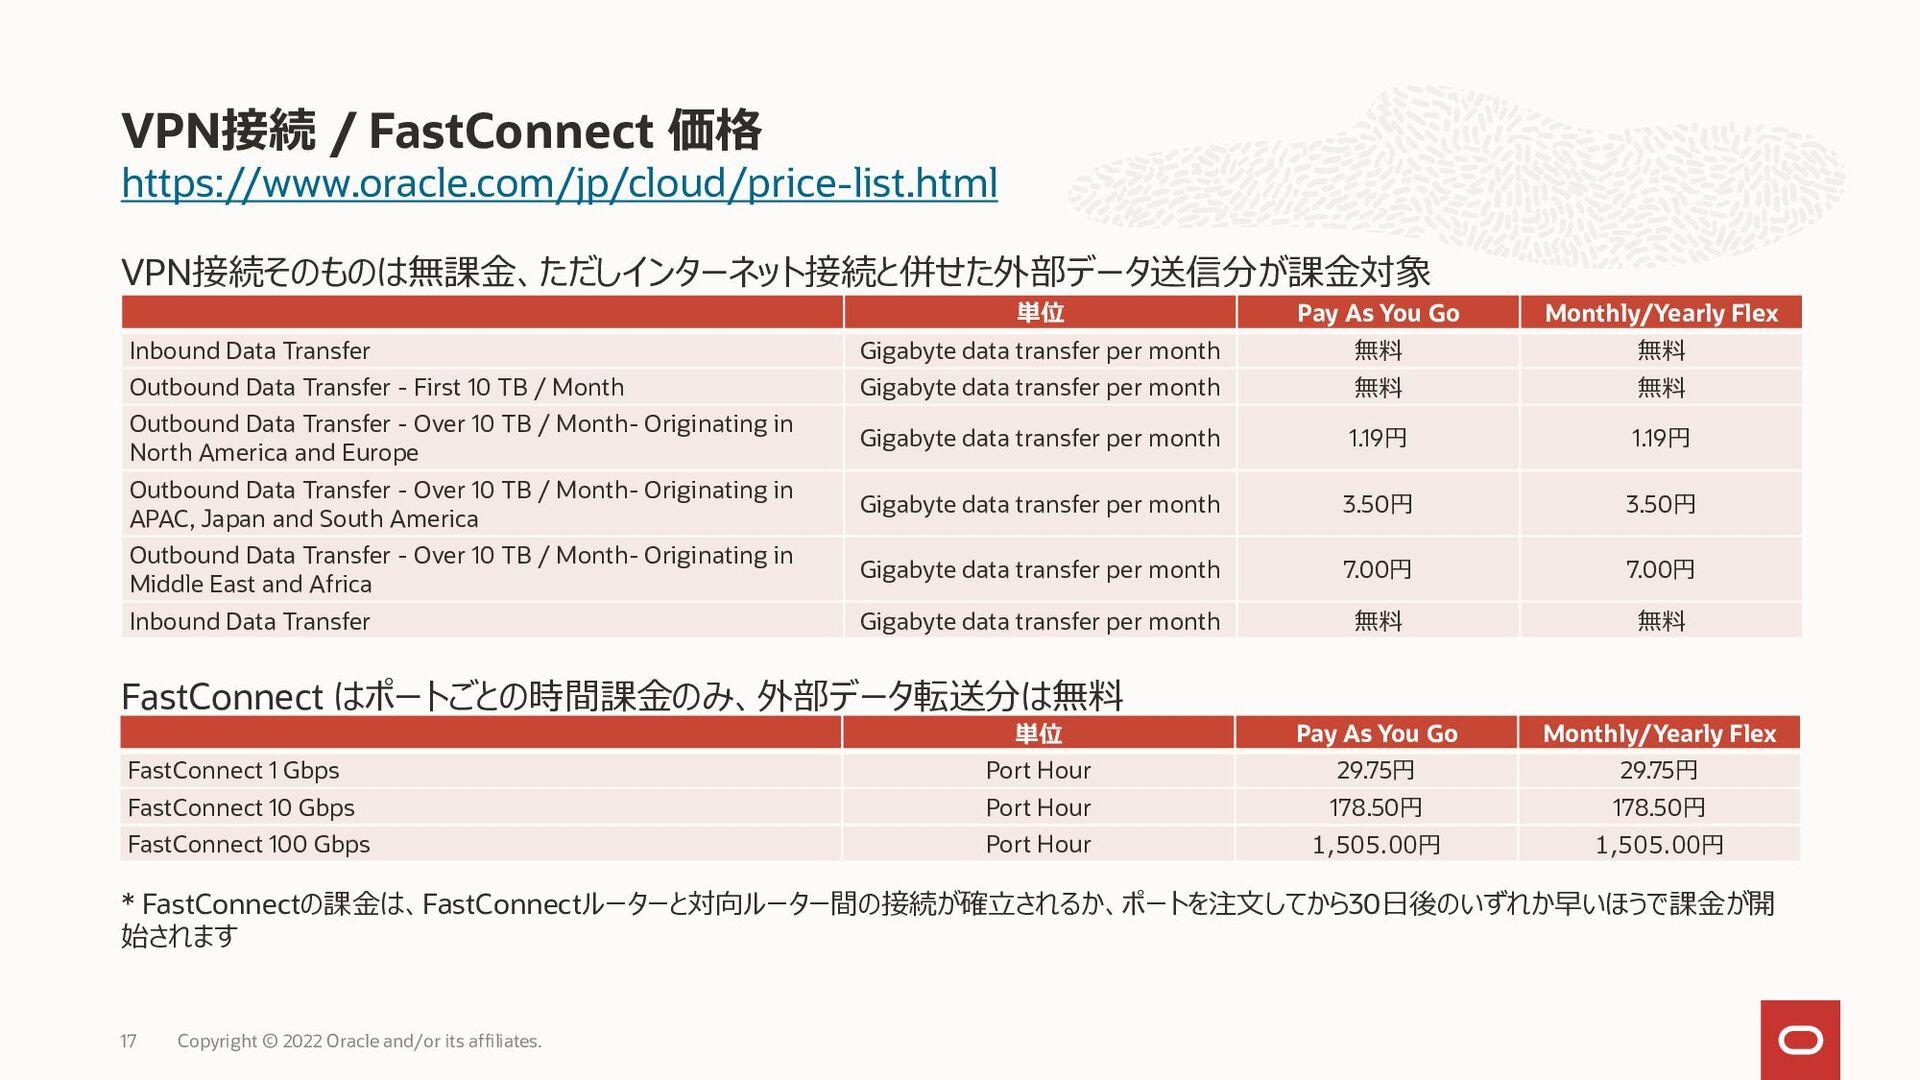 https://www.oracle.com/jp/cloud/price-list.html...